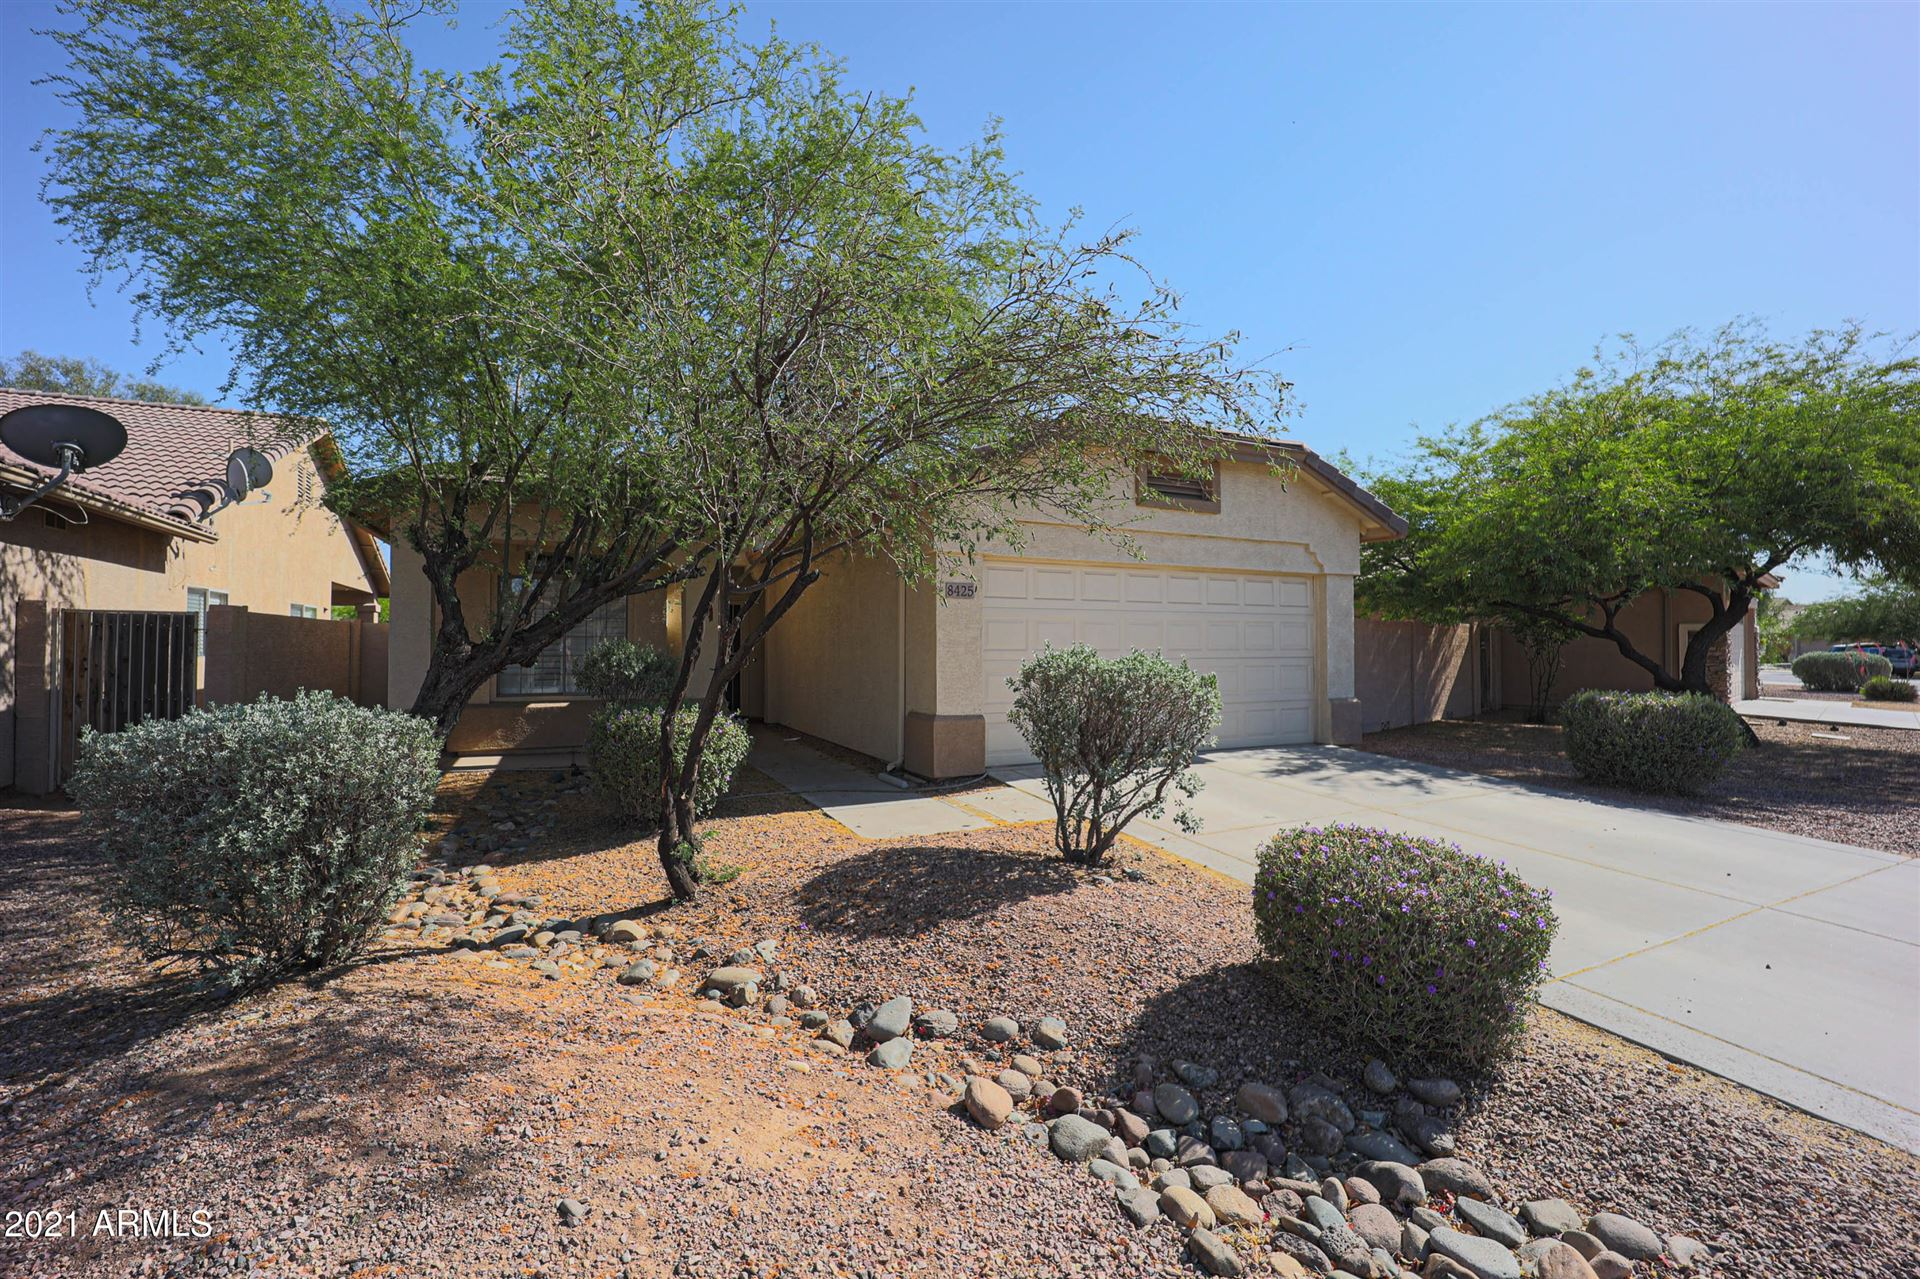 Photo of 8425 W SONORA Street, Tolleson, AZ 85353 (MLS # 6225709)